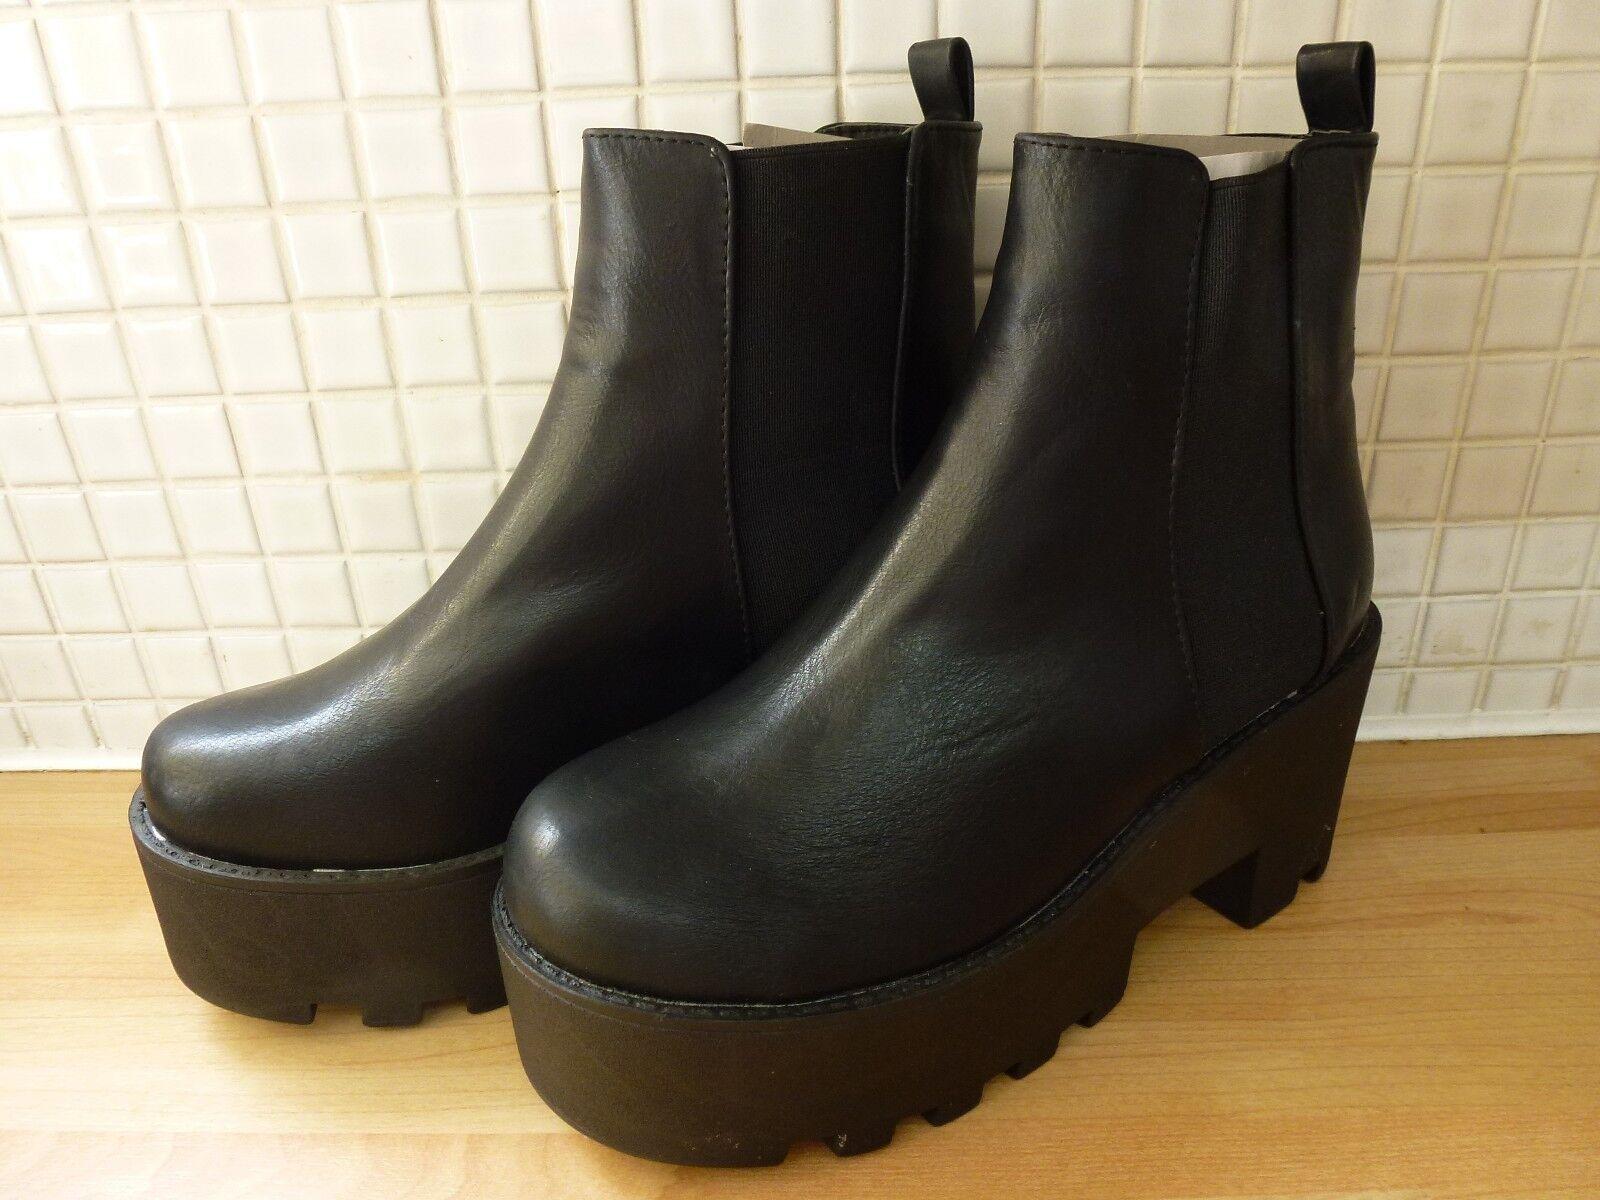 Salt & Pepper Womens Girls High Platform Chelsea Ankle Boots 3/36 NEW Black